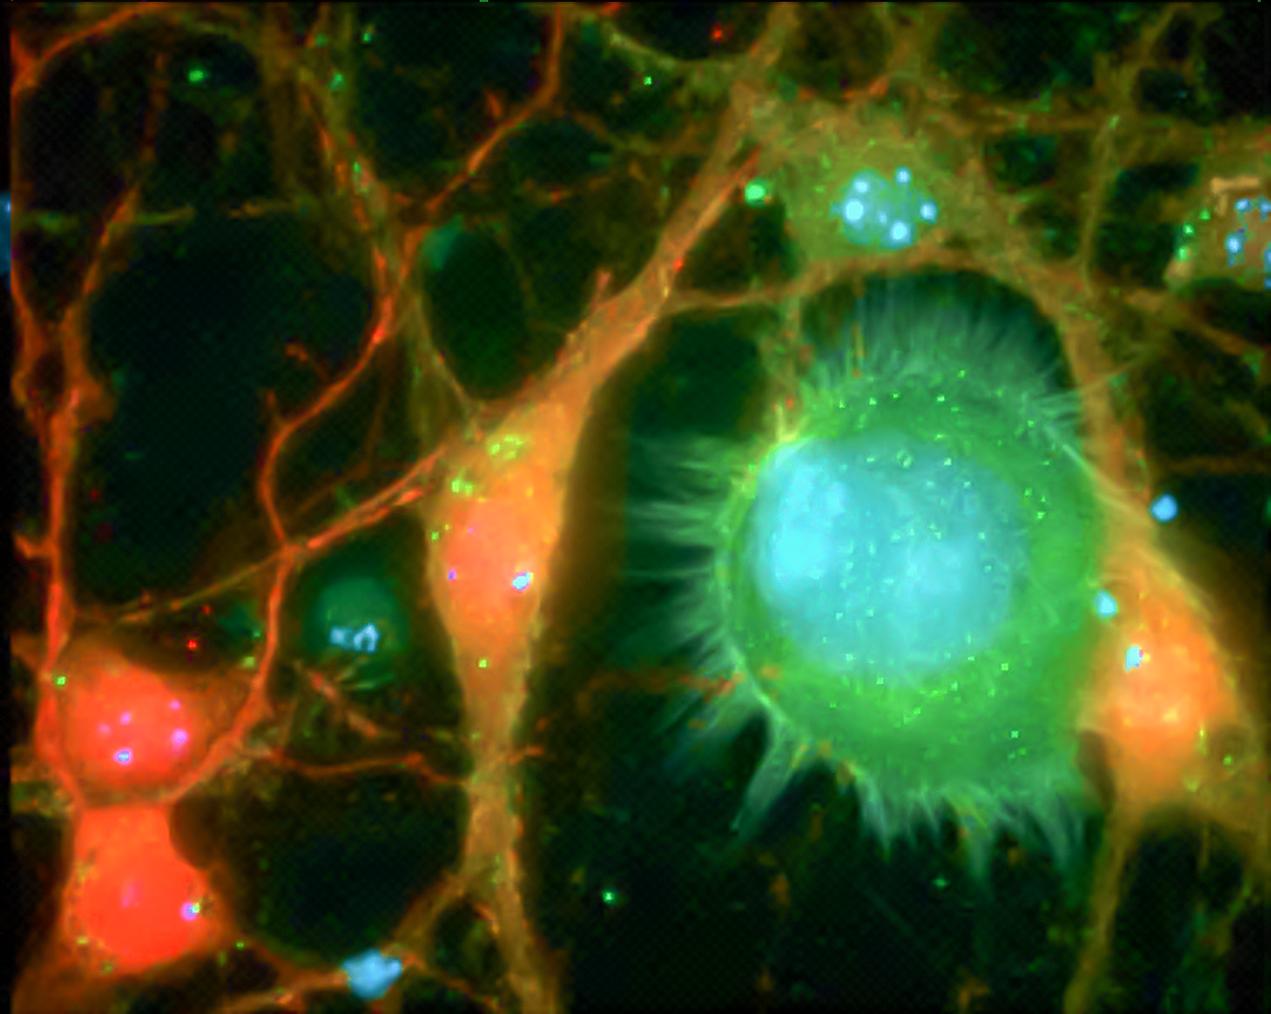 Metastatic brain cancer cells